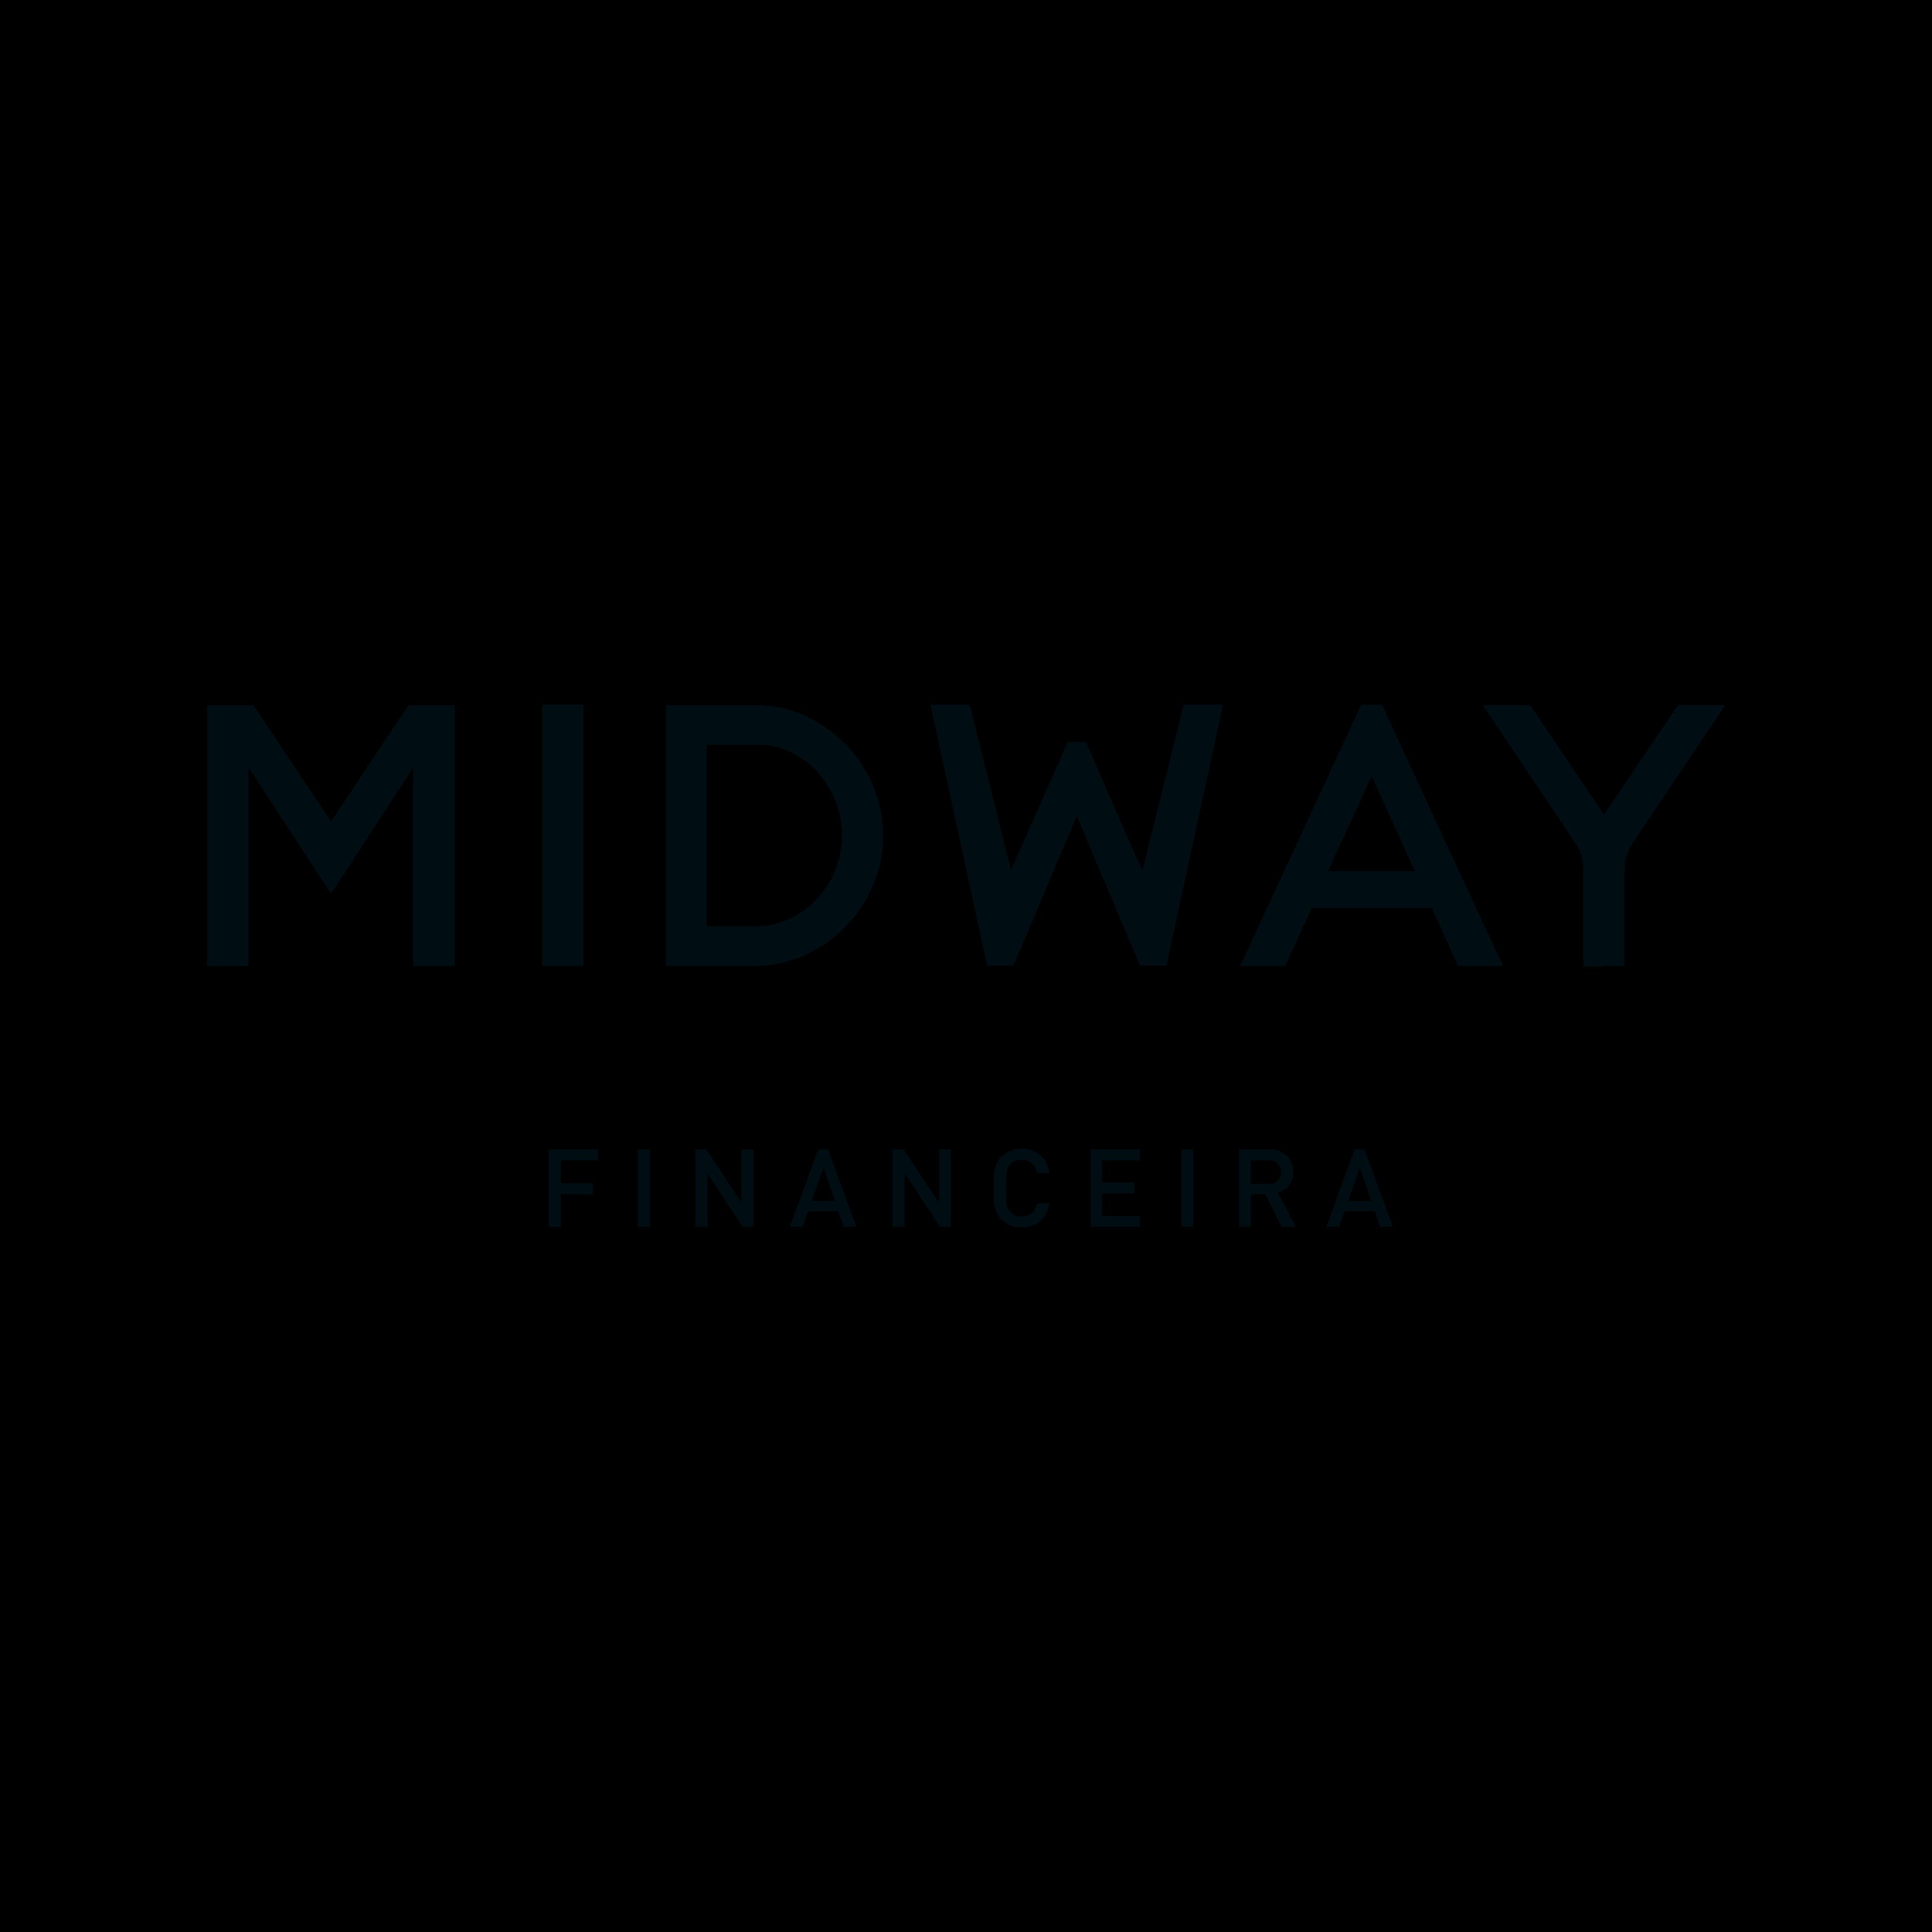 midway financeira logo 0 - Midway Financeira Logo